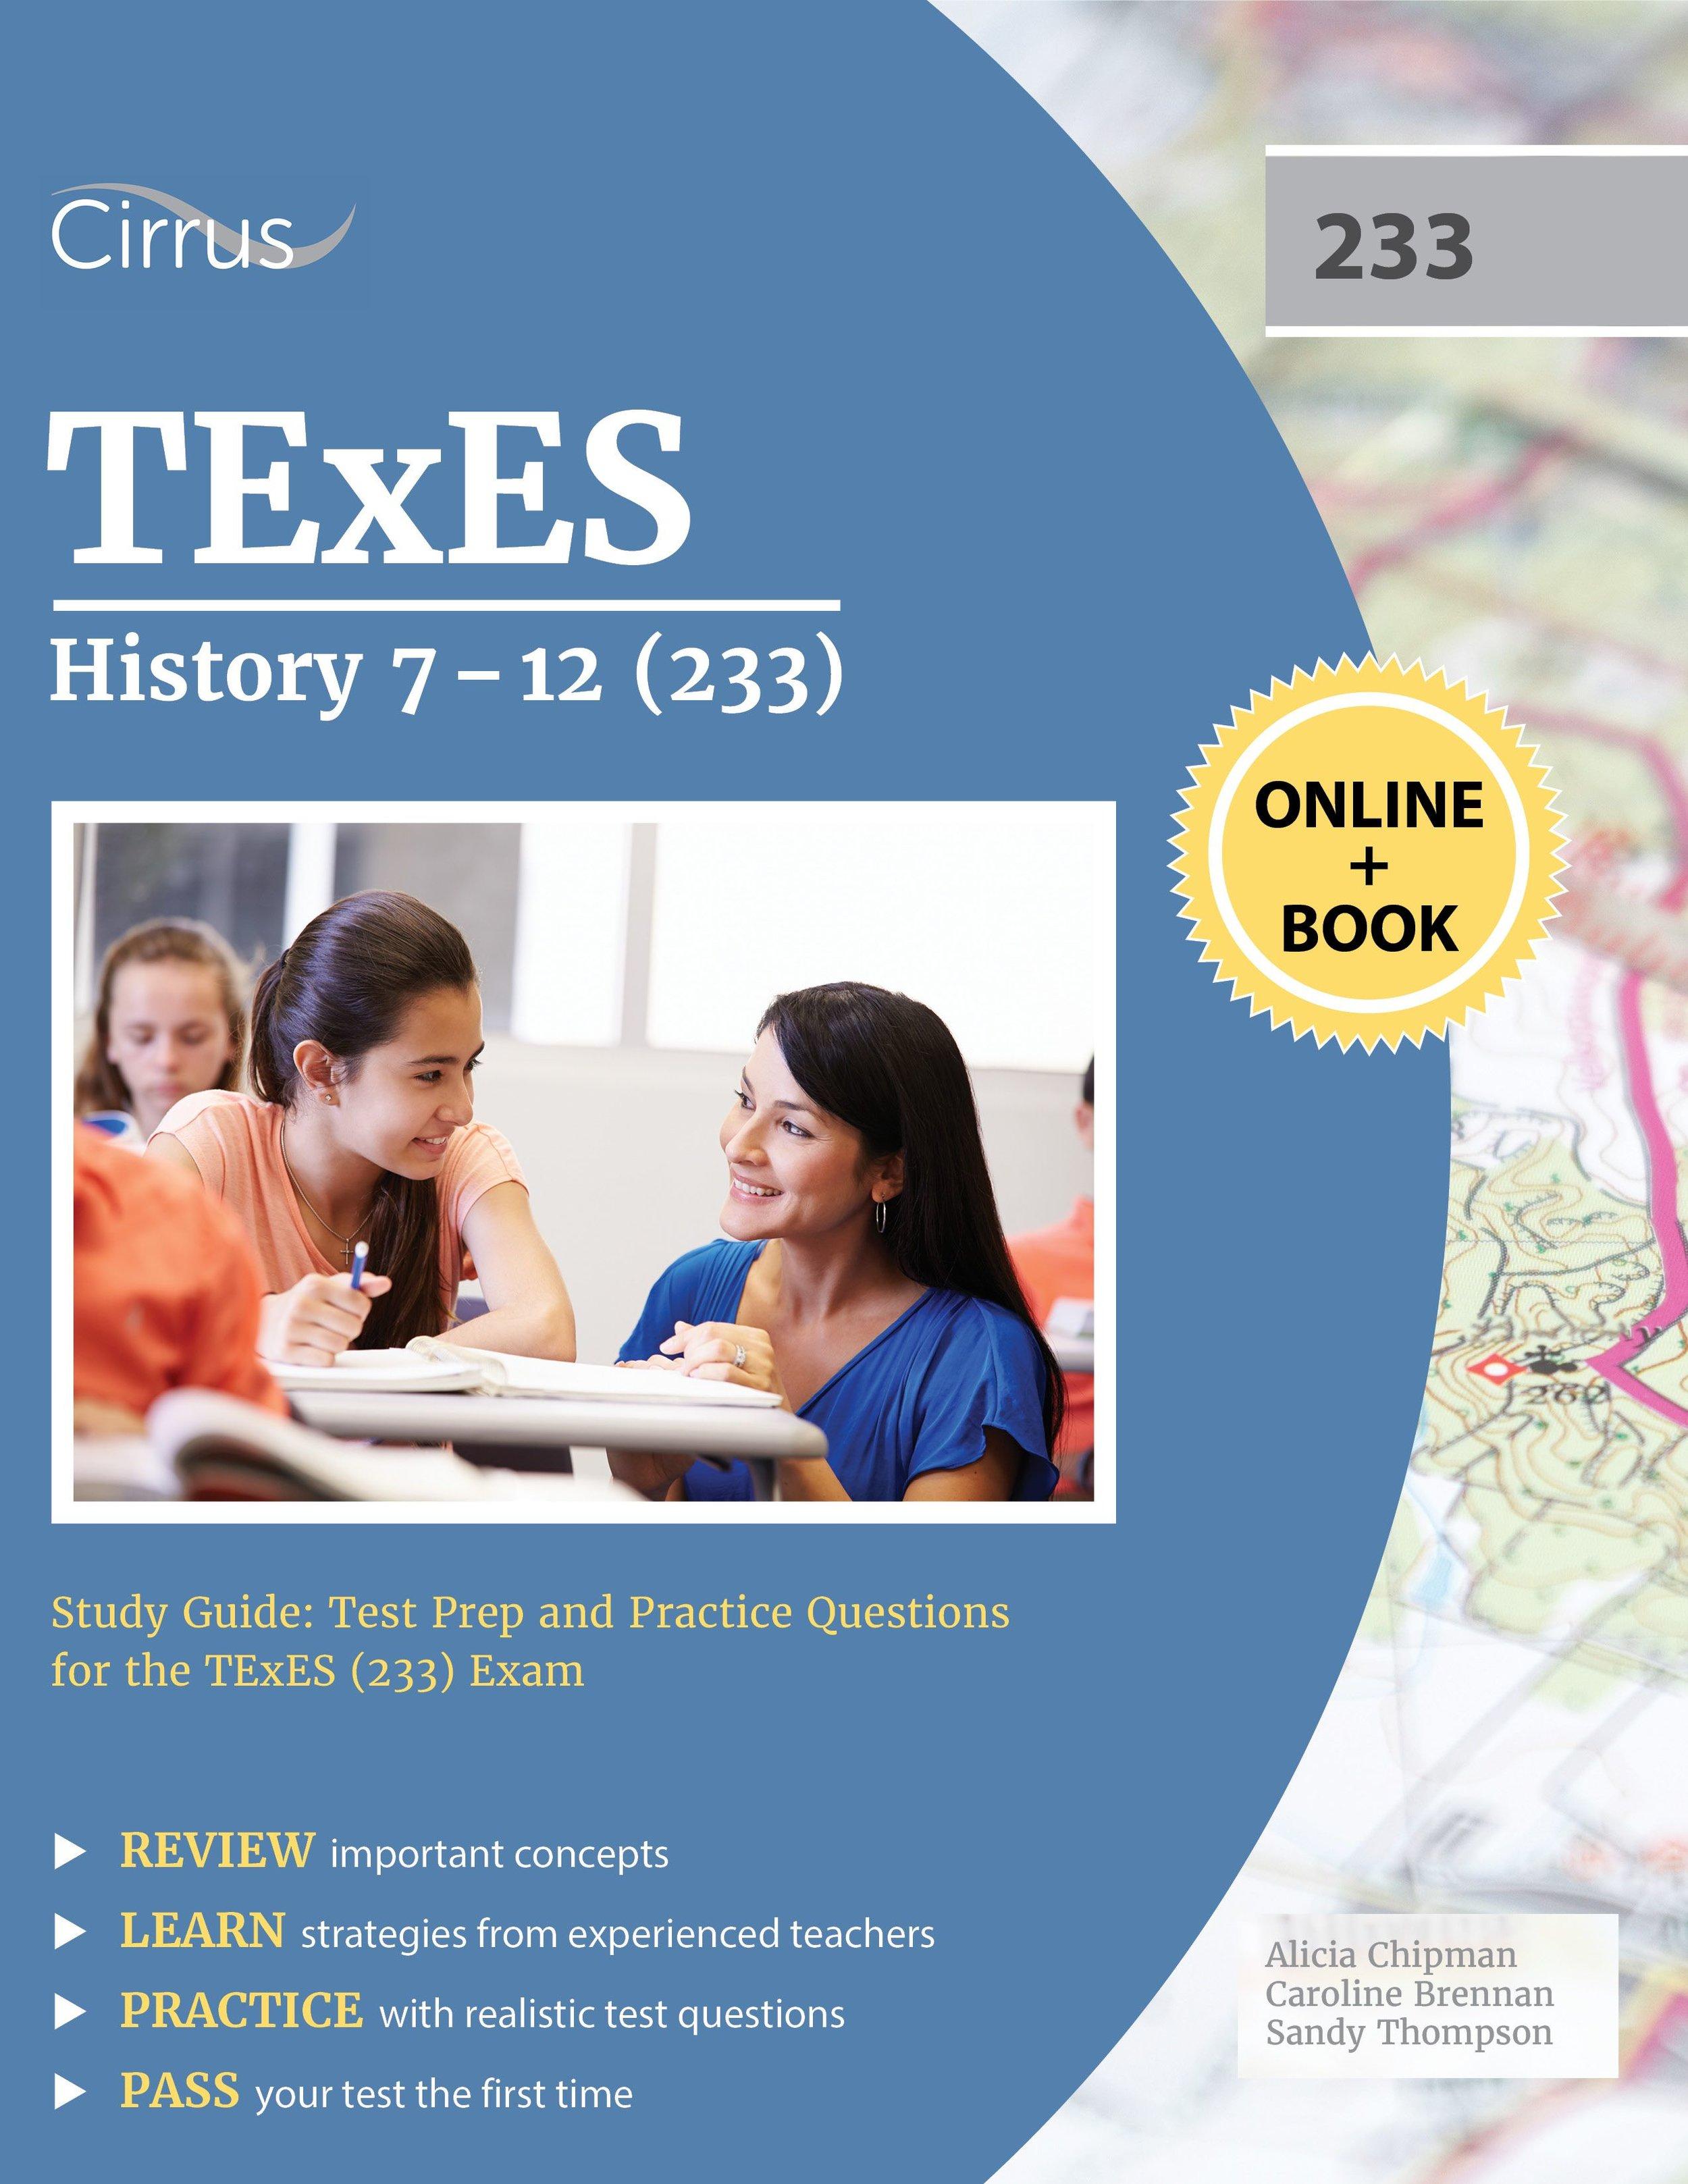 TExES_history_cover_website-compressor.jpg